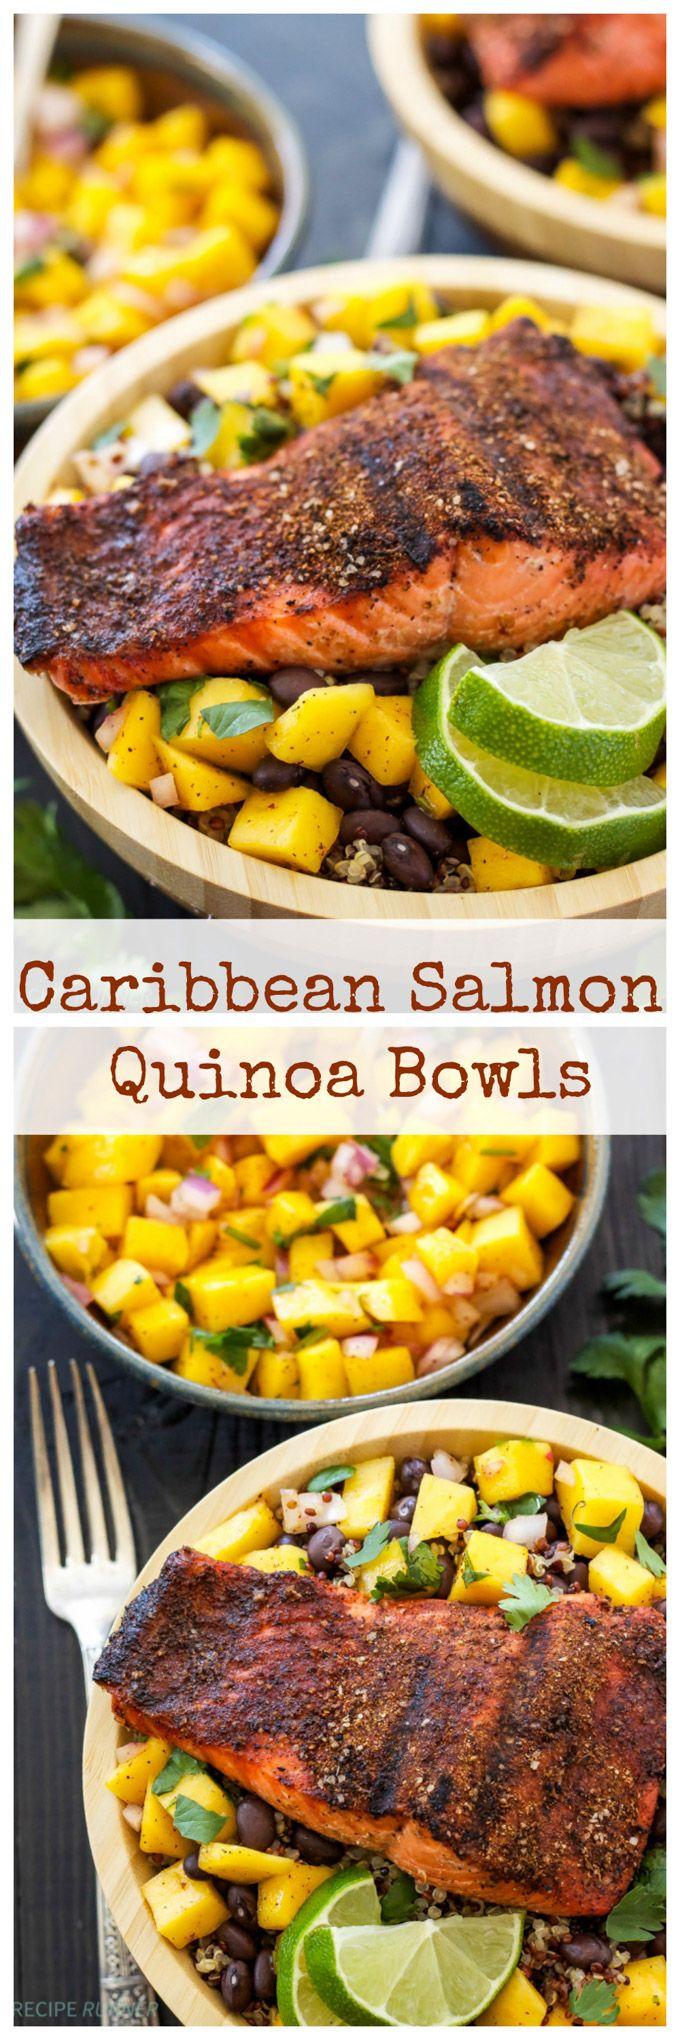 Caribbean Salmon Quinoa Bowls | Caribbean spice rubbed salmon on top of quinoa, black beans, and fresh mango salsa!